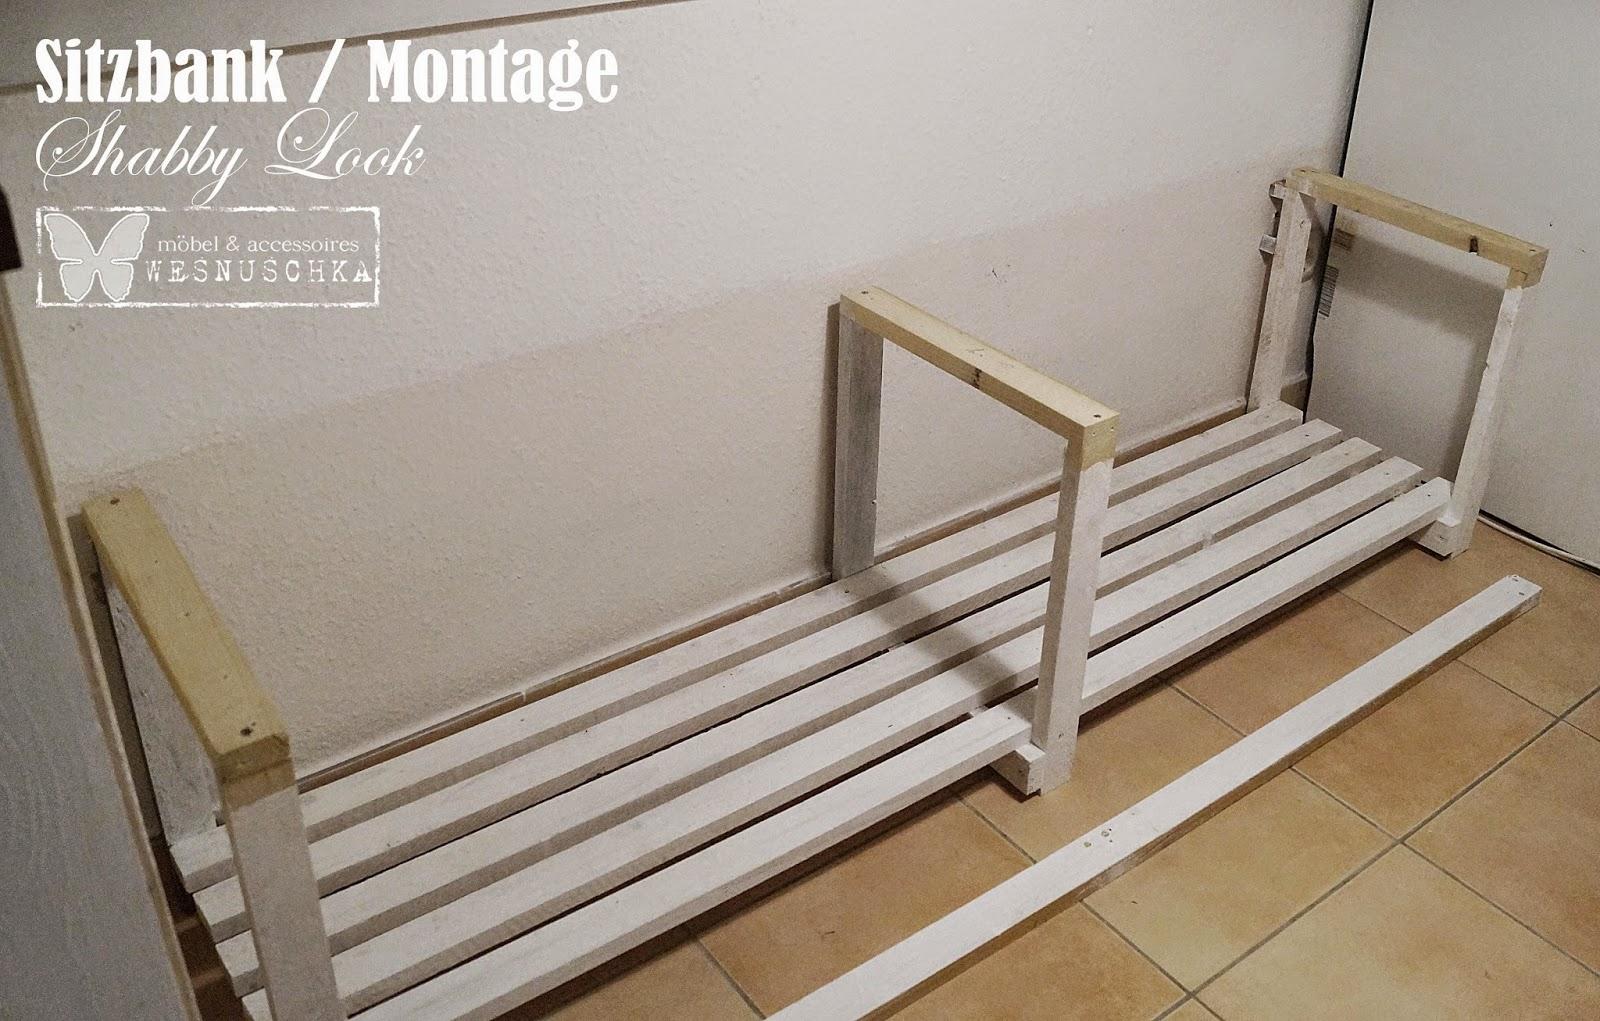 sitzbank polster selber machen sitzbank mit polster selber bauen sitzbank polster selber. Black Bedroom Furniture Sets. Home Design Ideas